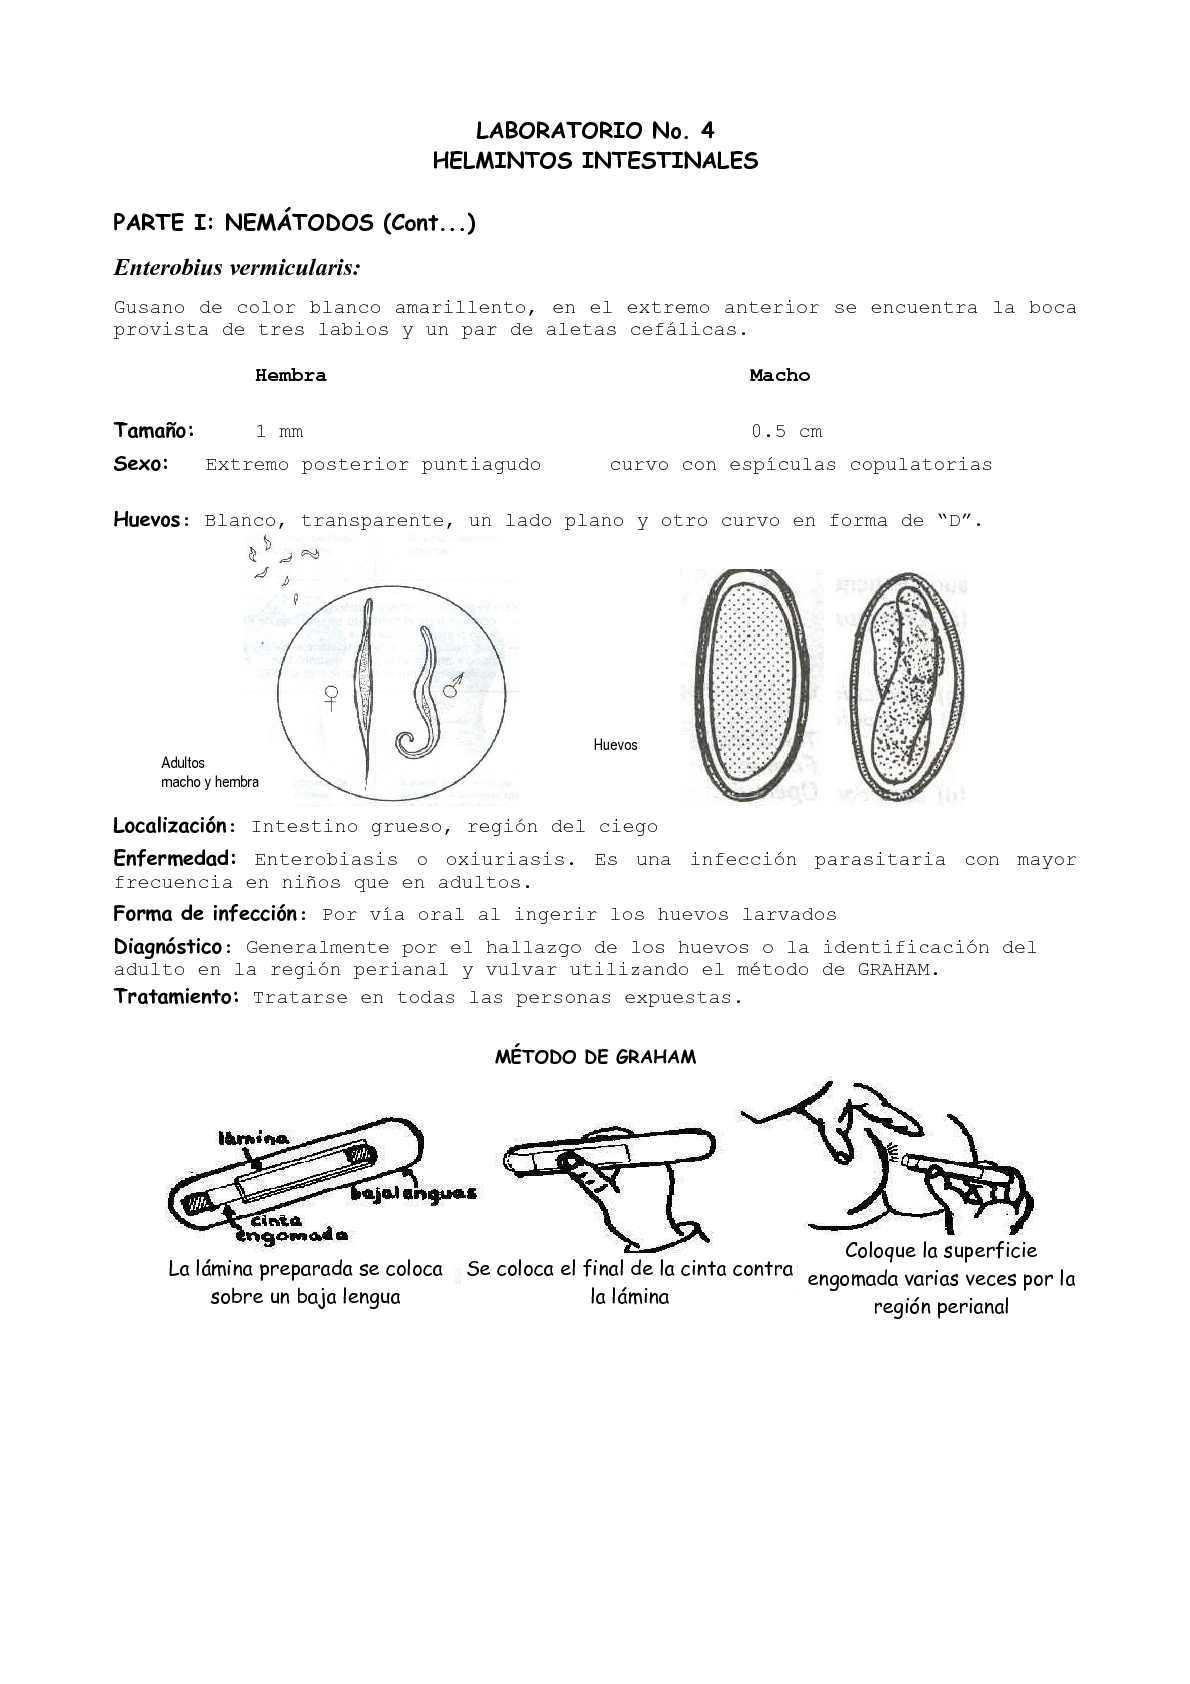 huevos de oxiuros vermicularis